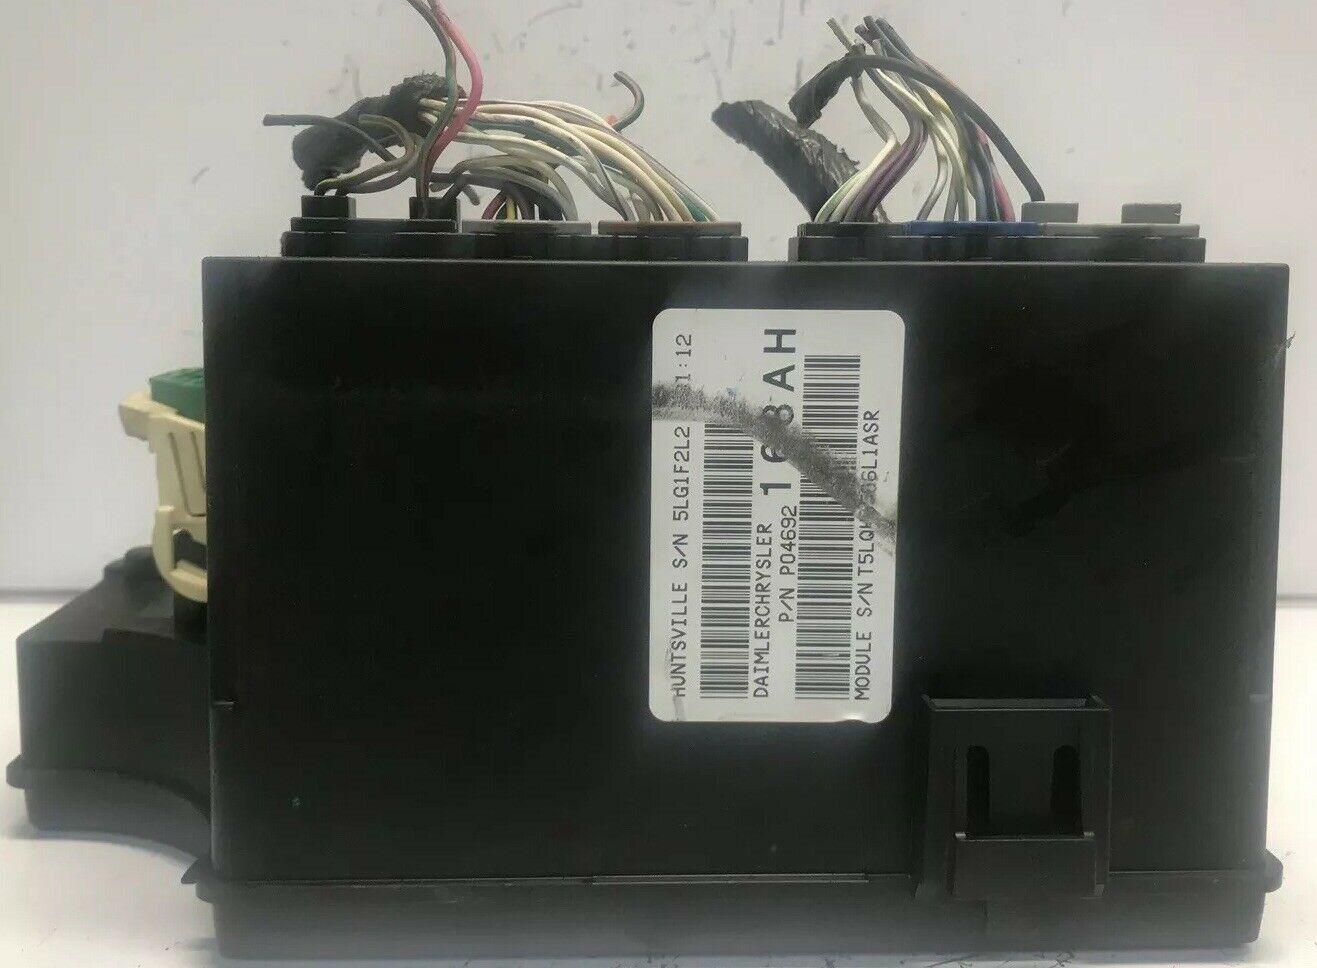 fuse box chrysler sebring 2007 tipm integrated power module    fuse       box       2007       chrysler     tipm integrated power module    fuse       box       2007       chrysler